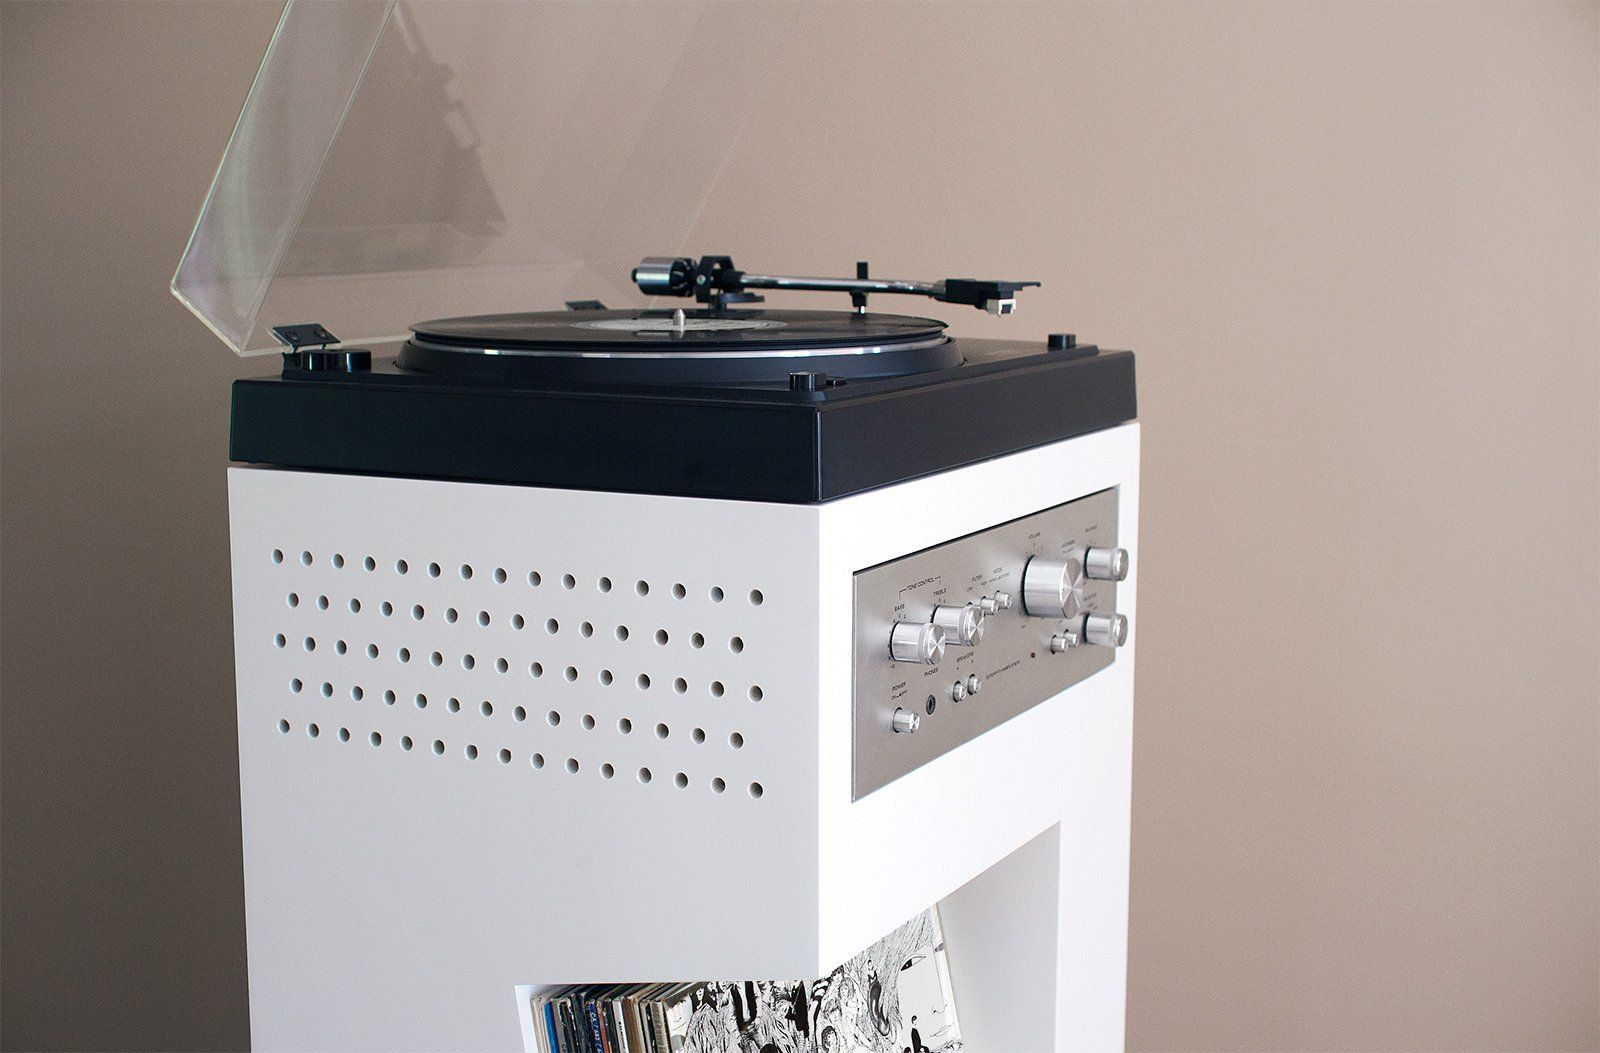 Meuble Platine Vinyle Guillaume Bouvet Artisan Menuisier Designer Meuble Pour Platine Vinyle Meuble Vinyle Meuble Bois Recycle